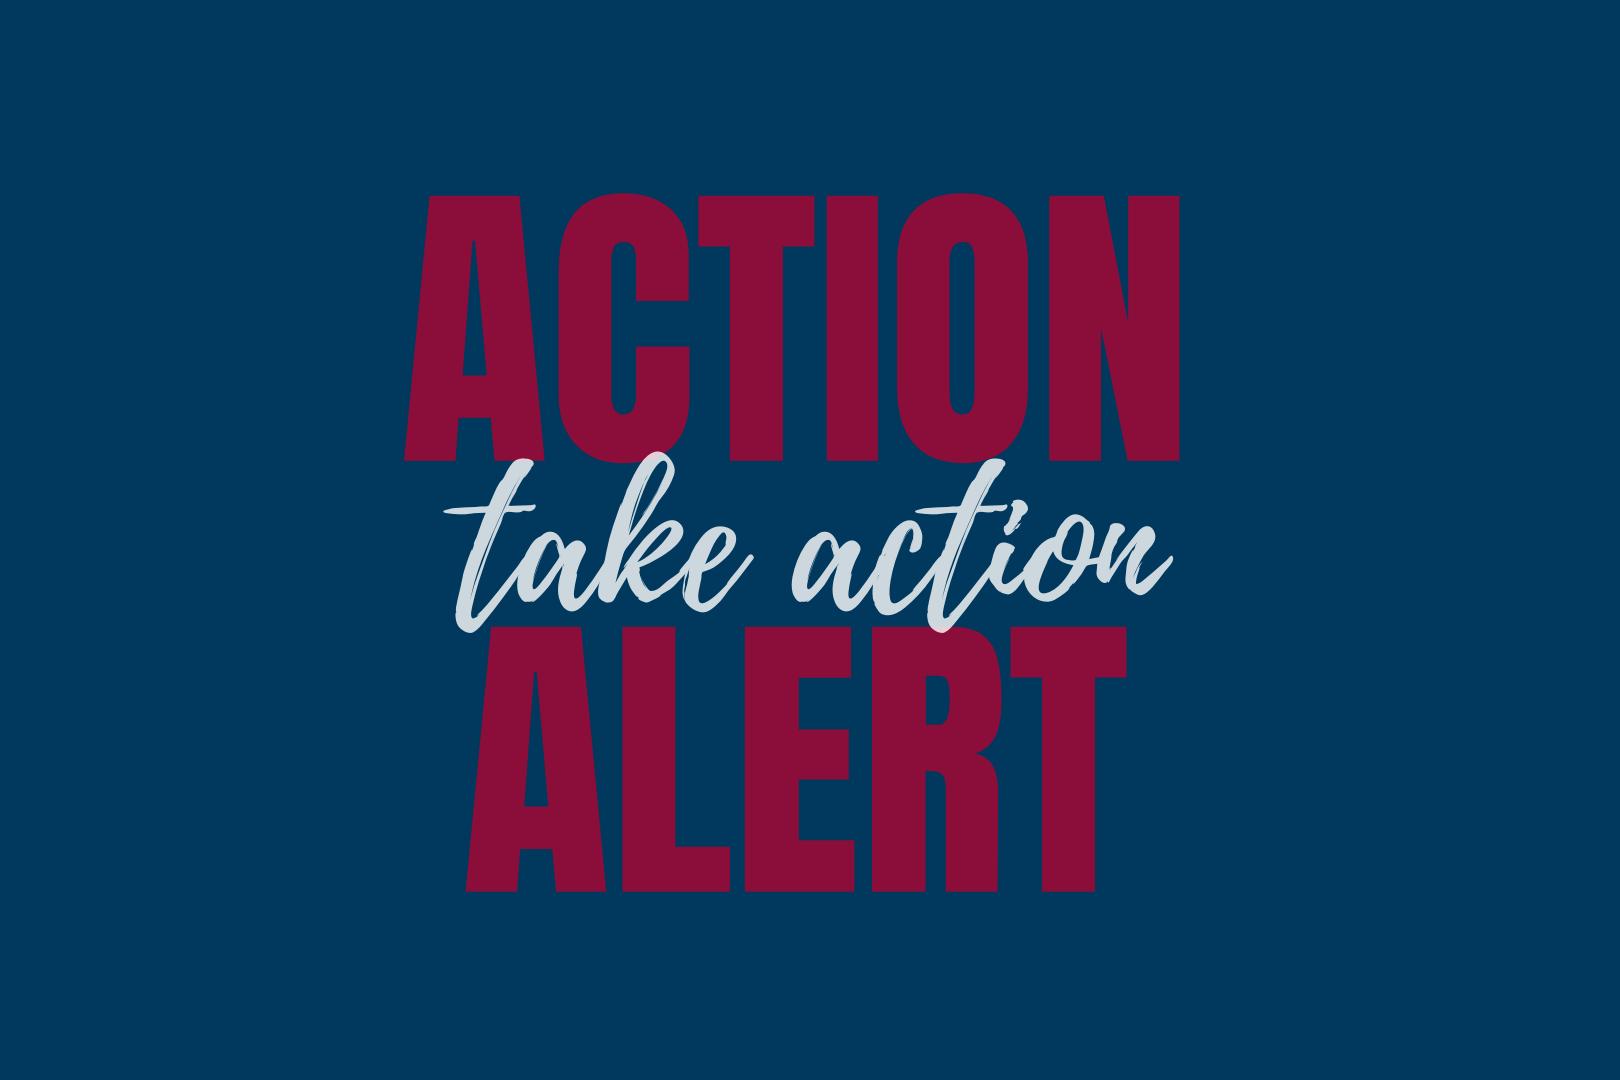 Action Alert Take Action